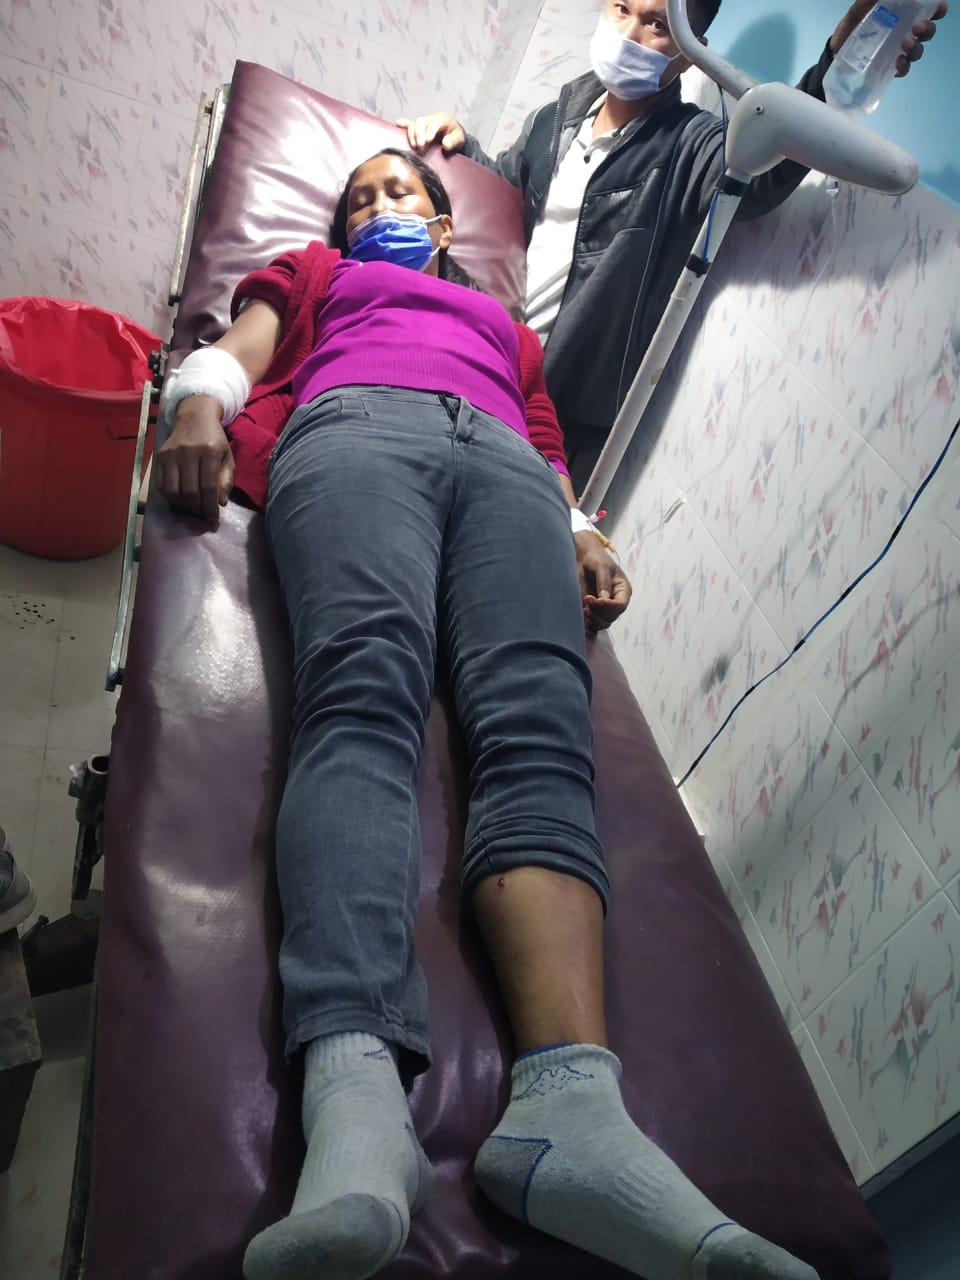 BREAKING: Bomb blast at RIMS hospital, Imphal